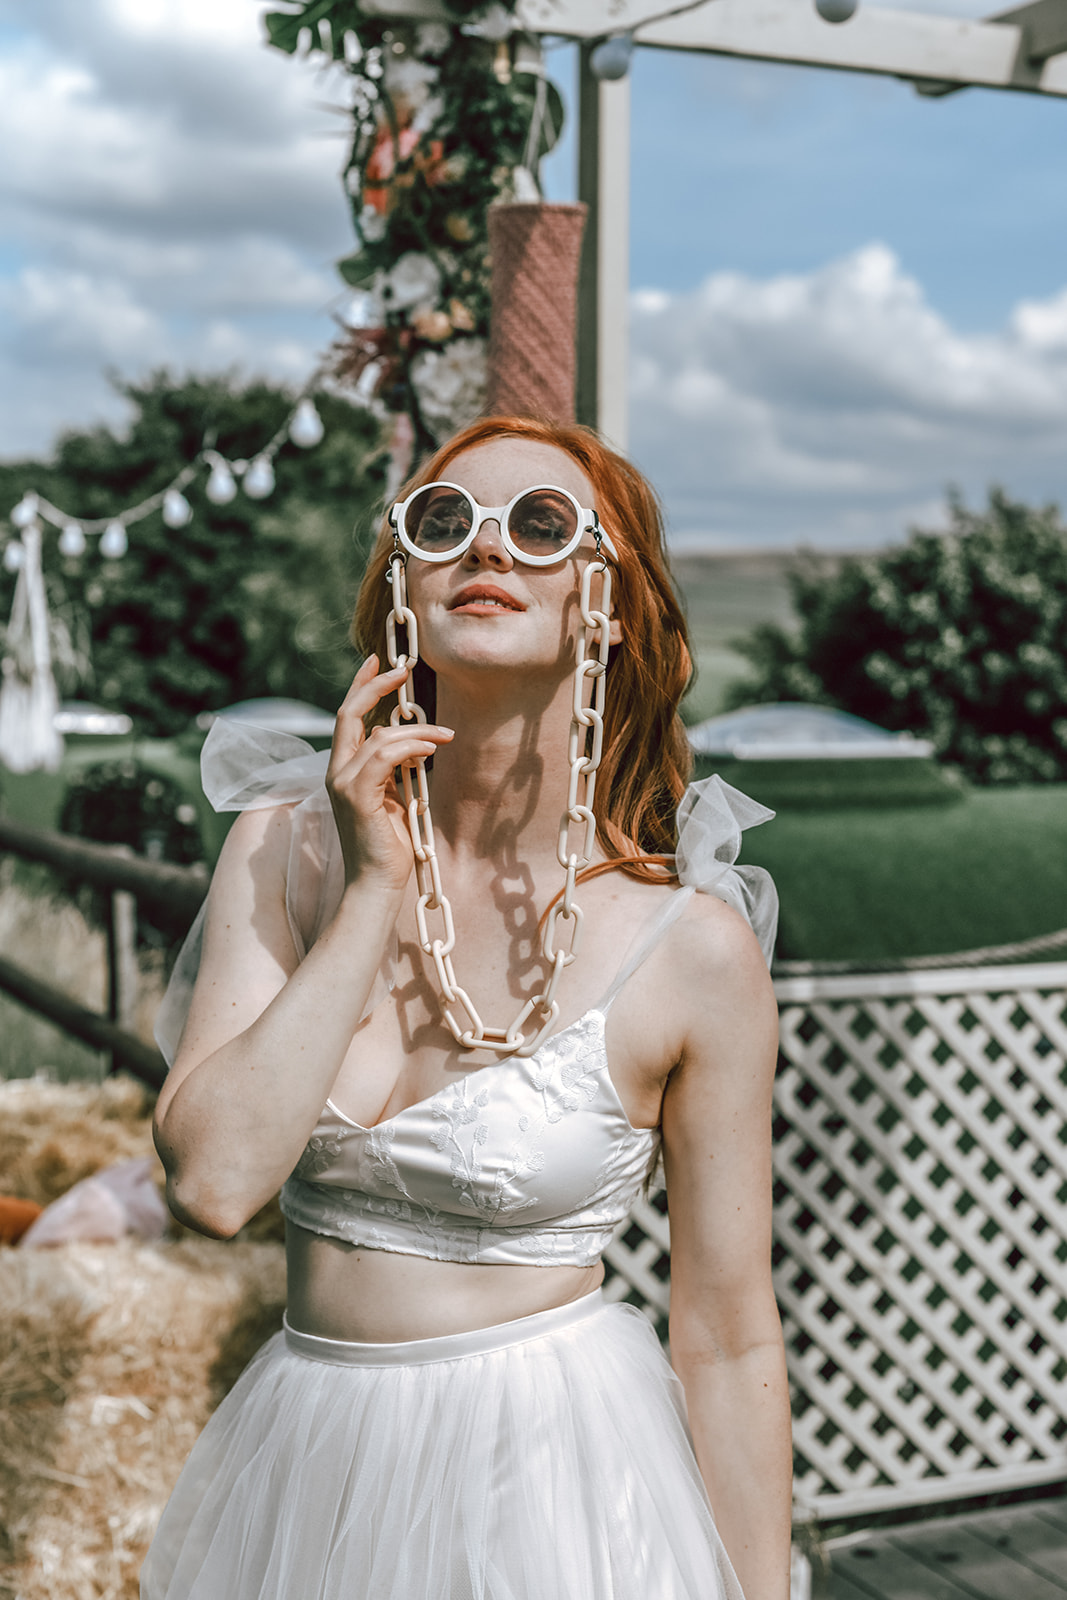 rustic festival wedding - wedding glasses - unique wedding wear - unique bridal look - alternative bridalwear